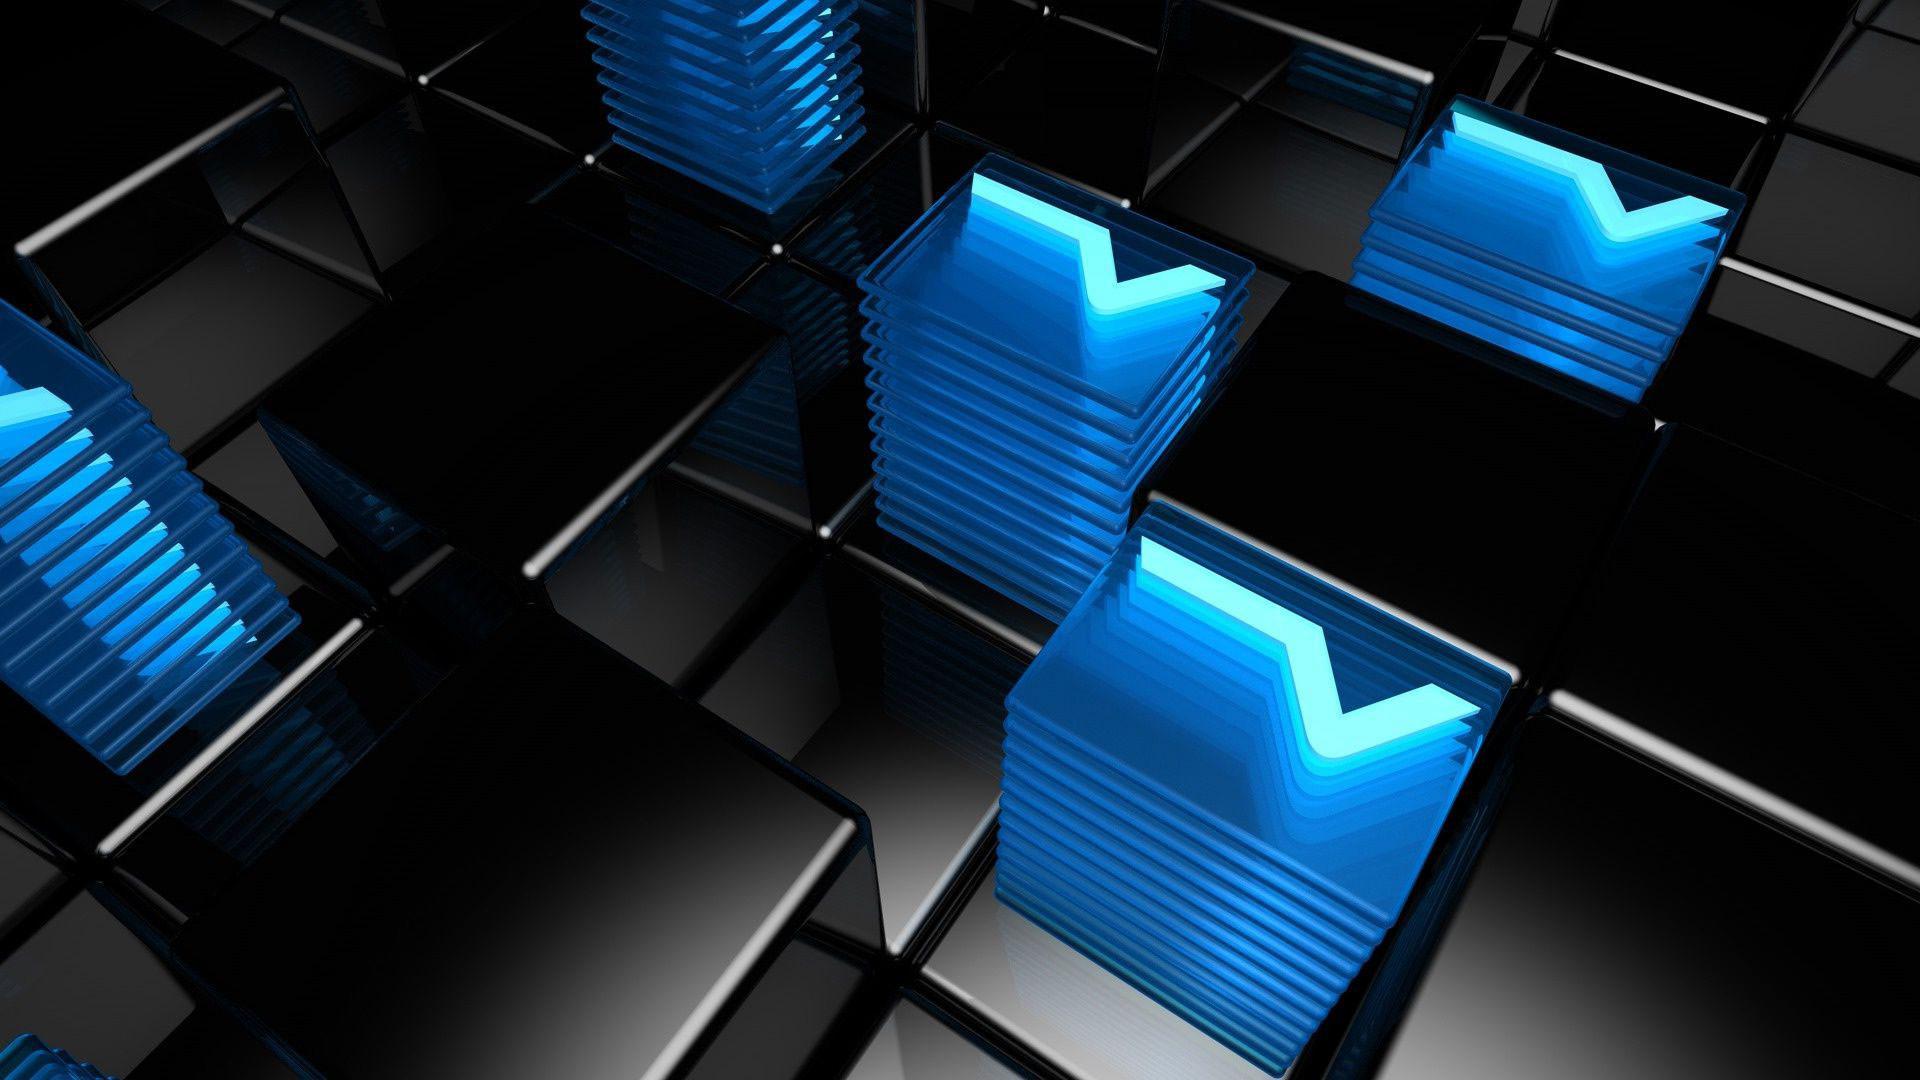 hd pics photos attractive digital blue black neon cubes hd quality desktop background  wallpaper